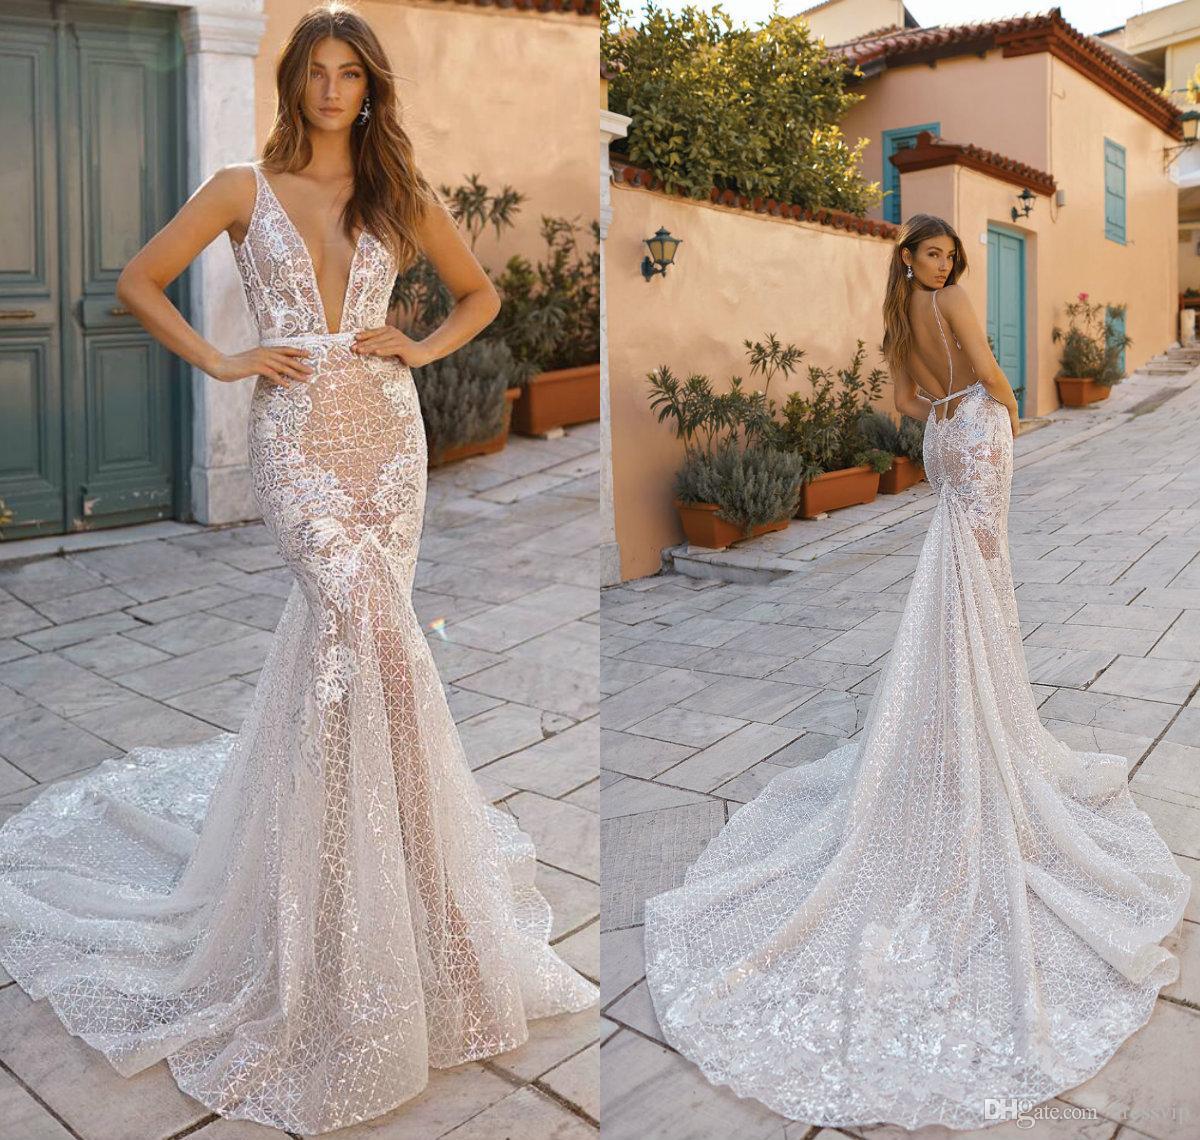 Lace Mermaid Wedding Dresses Deep V Neck Sexy Backless Sweep Train 2019 Berta Sweep Train Beach Wedding Dress Plus Size Vestidos De Novia